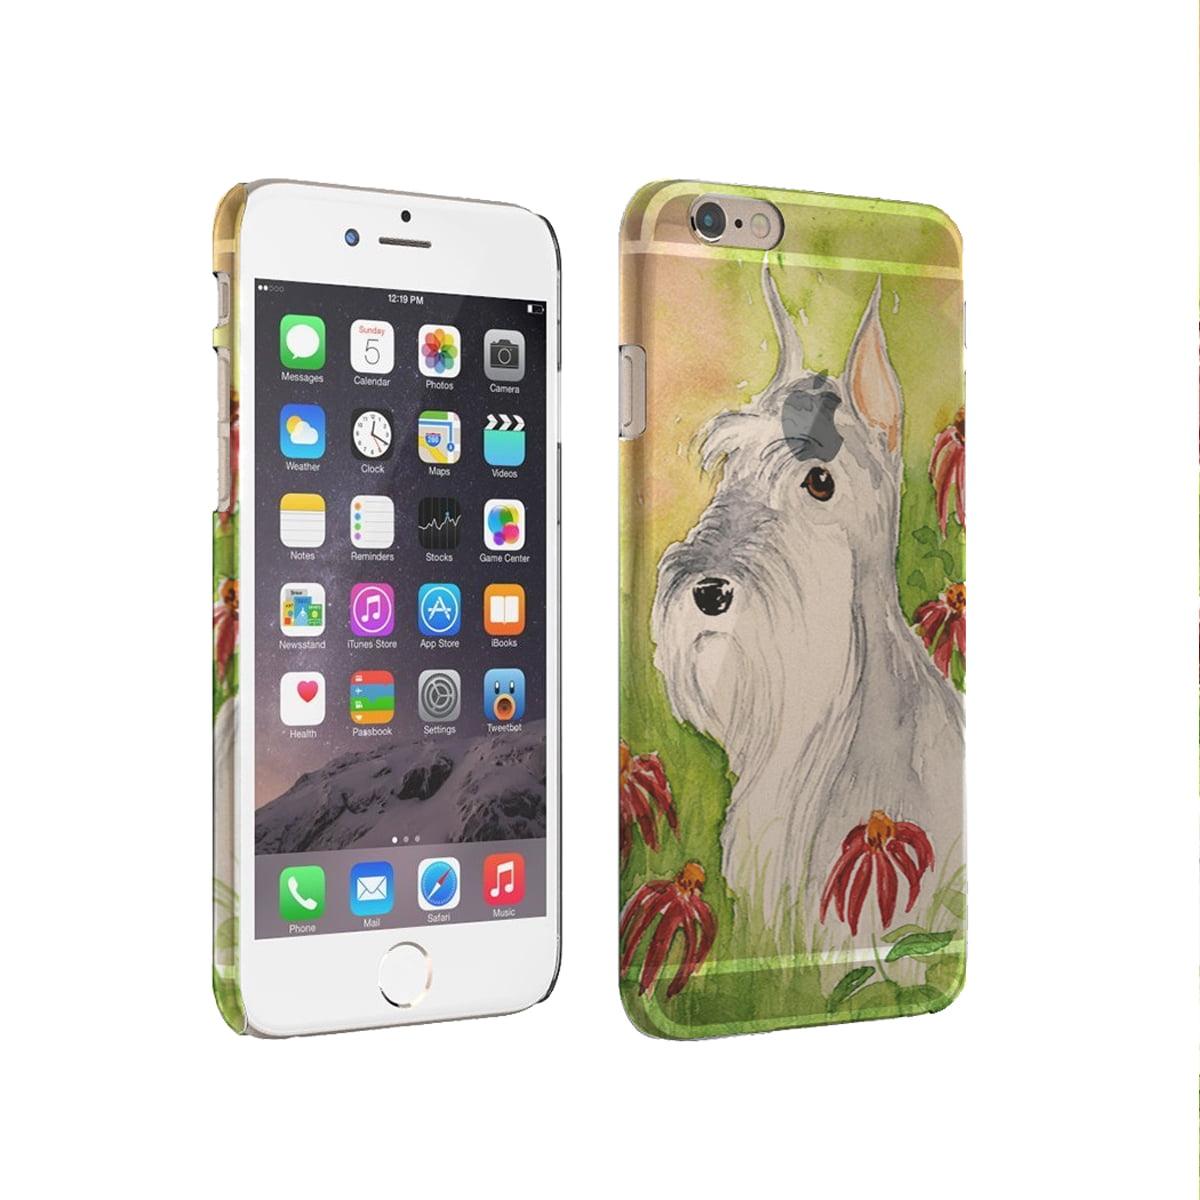 KuzmarK iPhone 6 Plus Clear Cover Case - Miniature Schnauzer Art by Denise Every